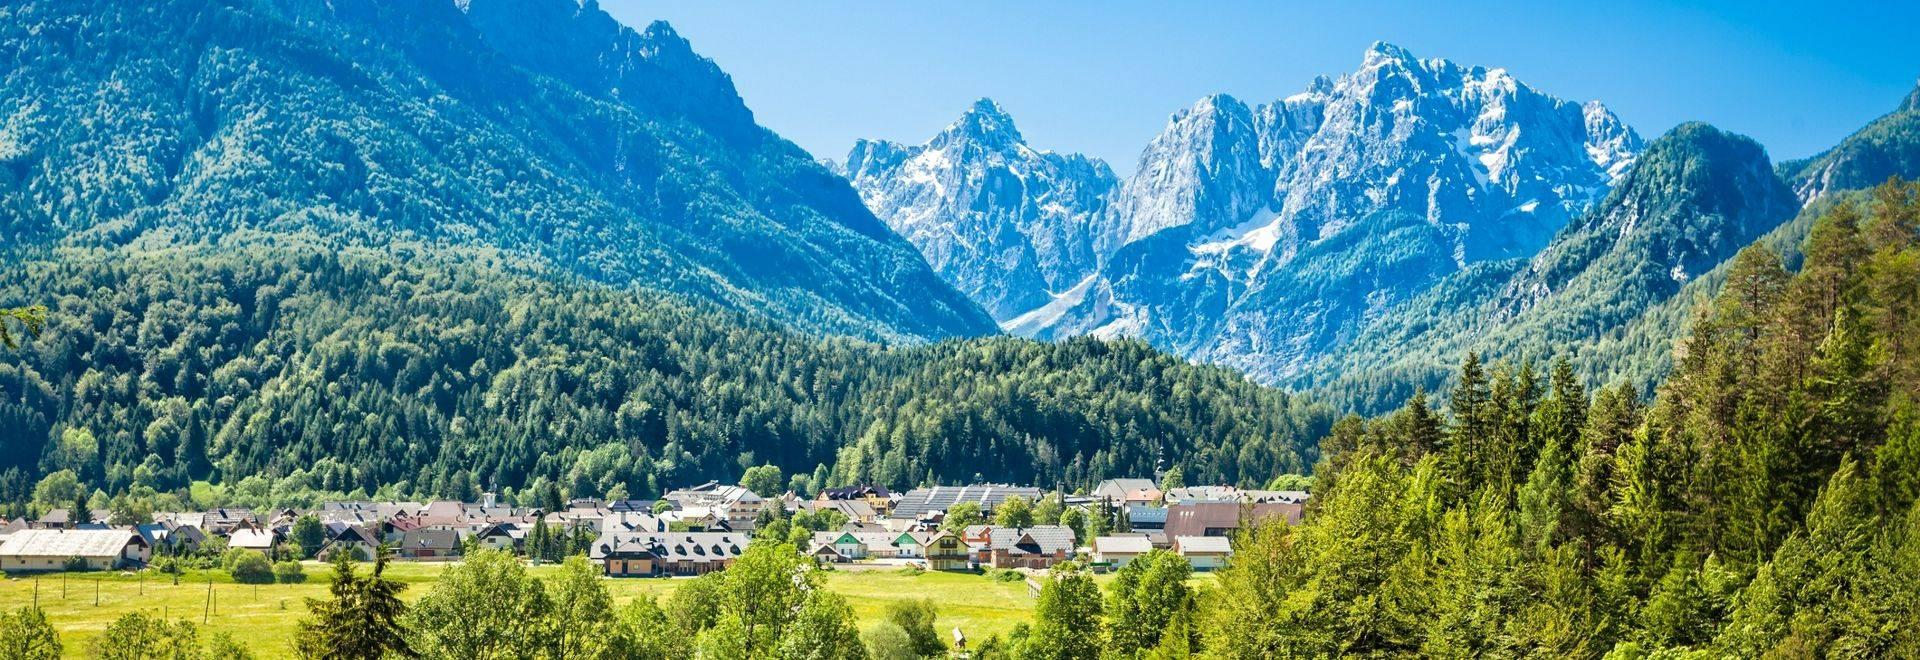 Travel destination Kranjska gora town with Julian alps behind, Slovenia.